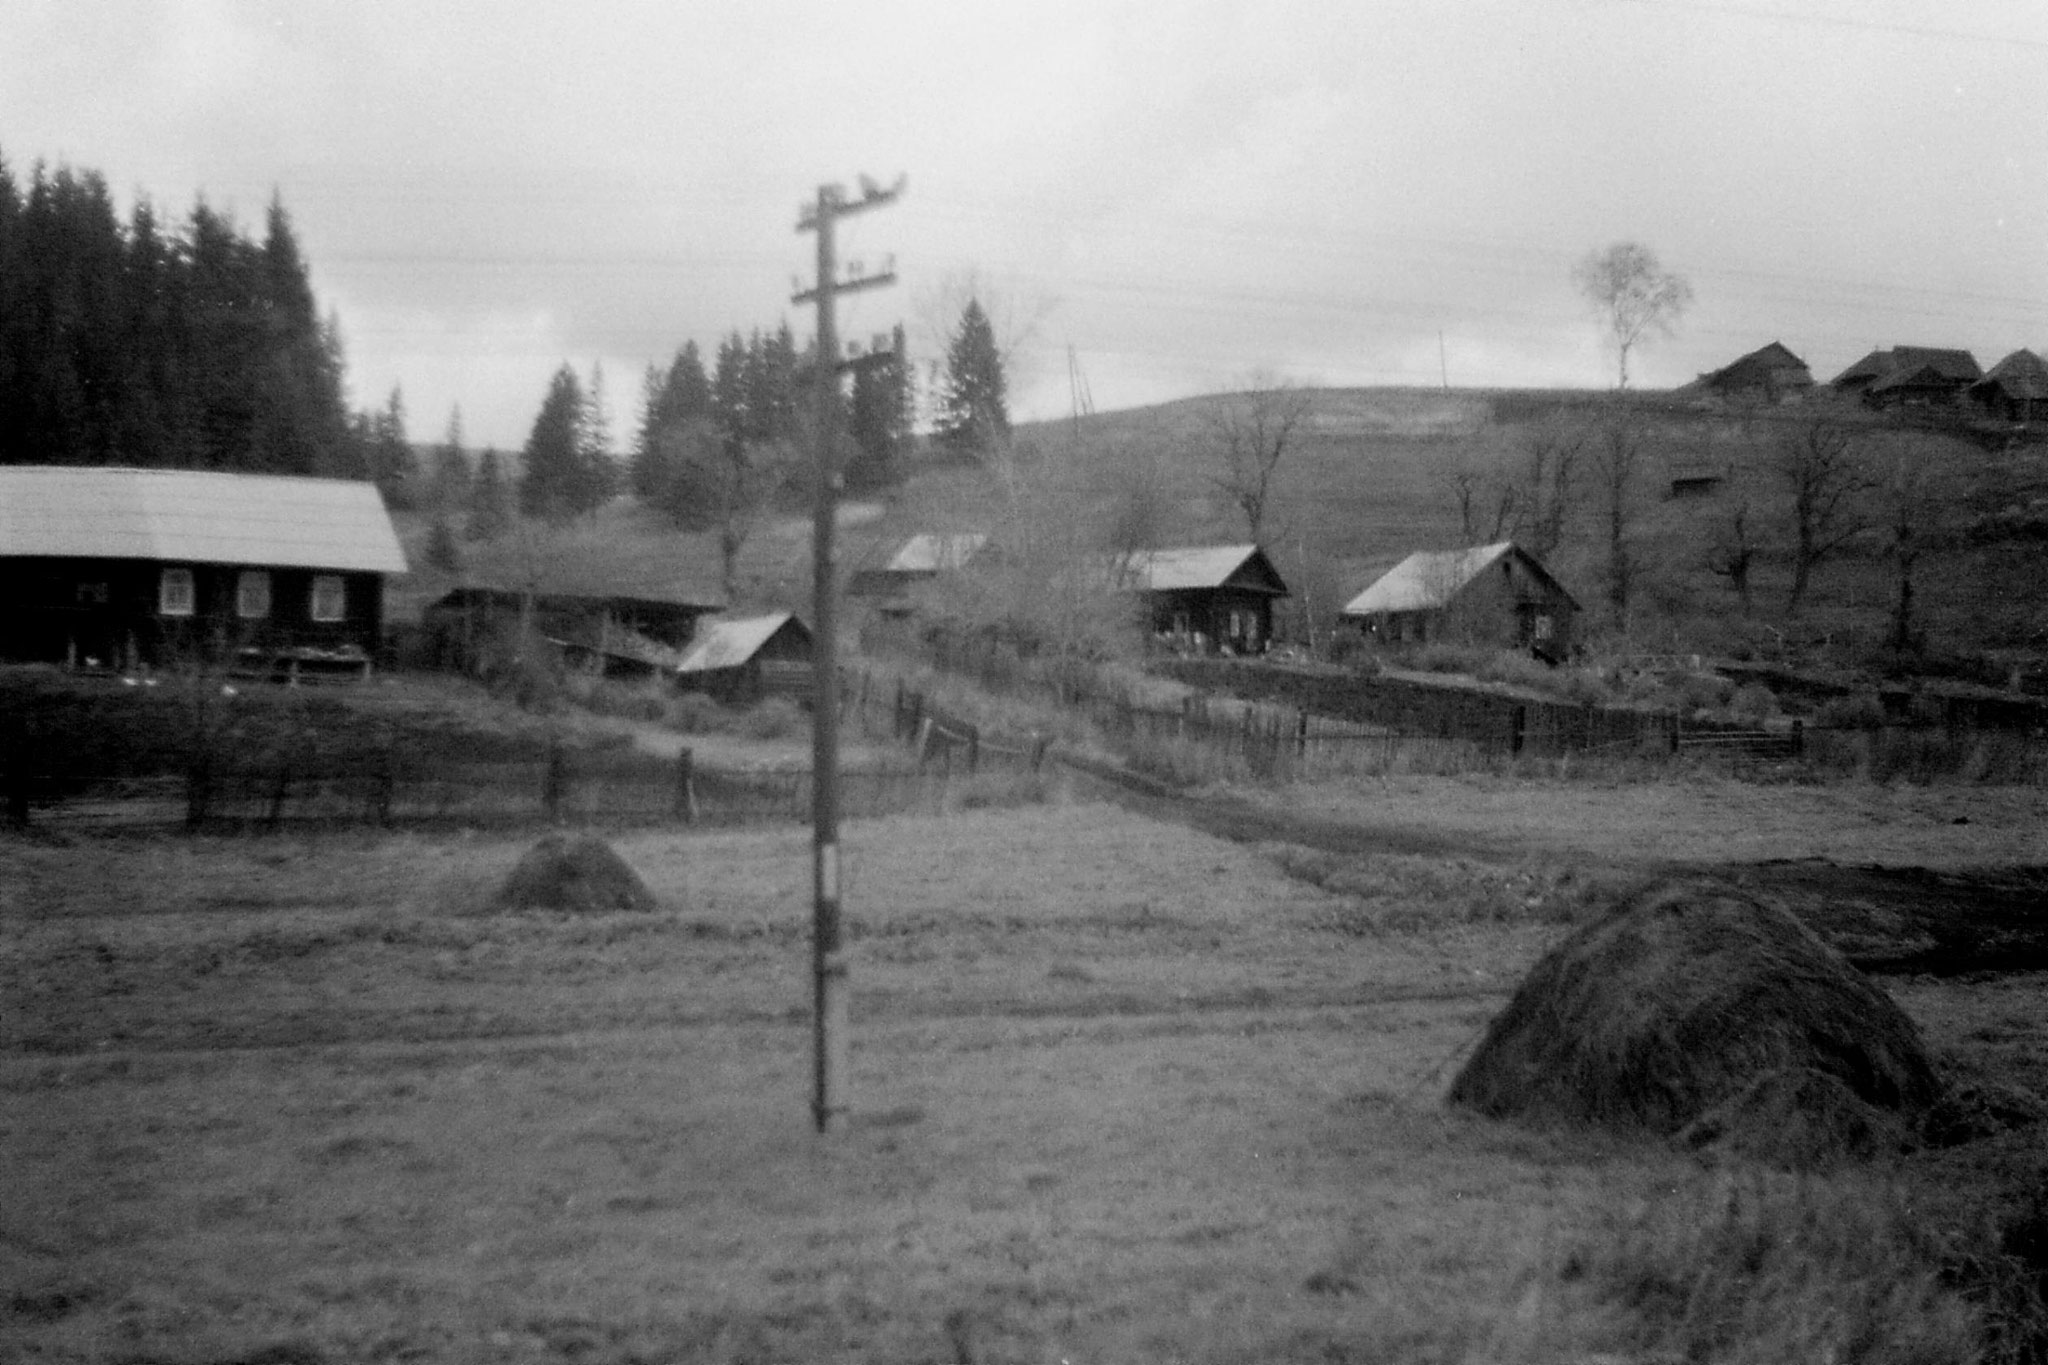 19/10/1988: 26: from Siberian Express between Balezino and Perm